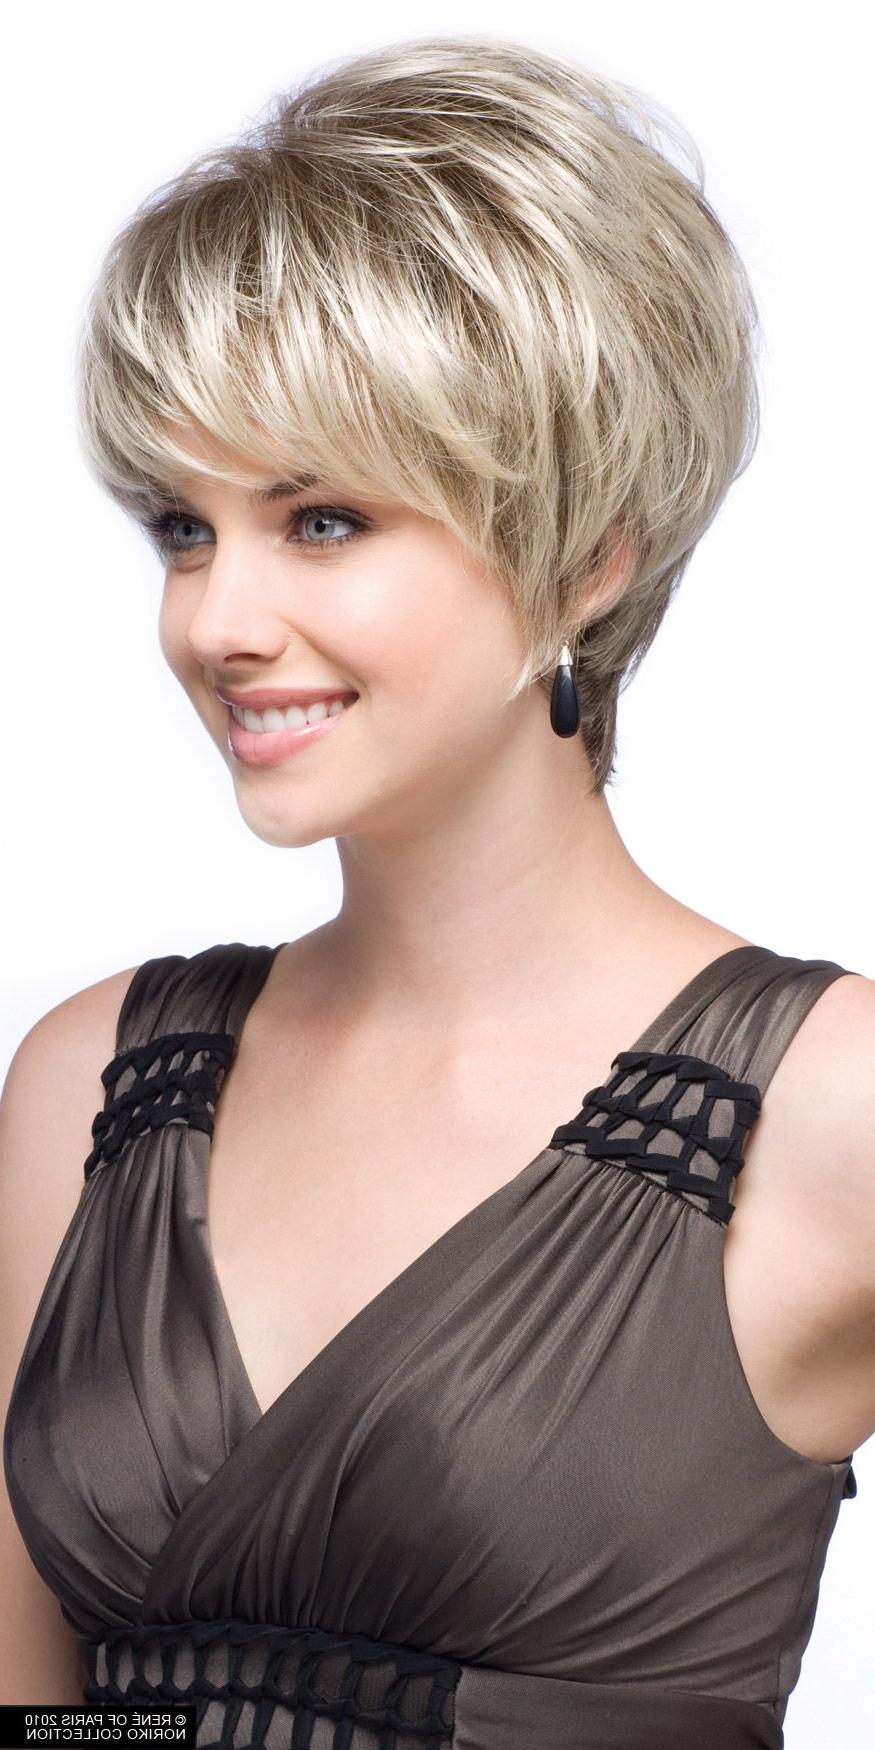 Wispy Short Wedge Haircuts | Noriko | Image Group London | Hair Did Throughout Wispy Short Haircuts (View 8 of 25)